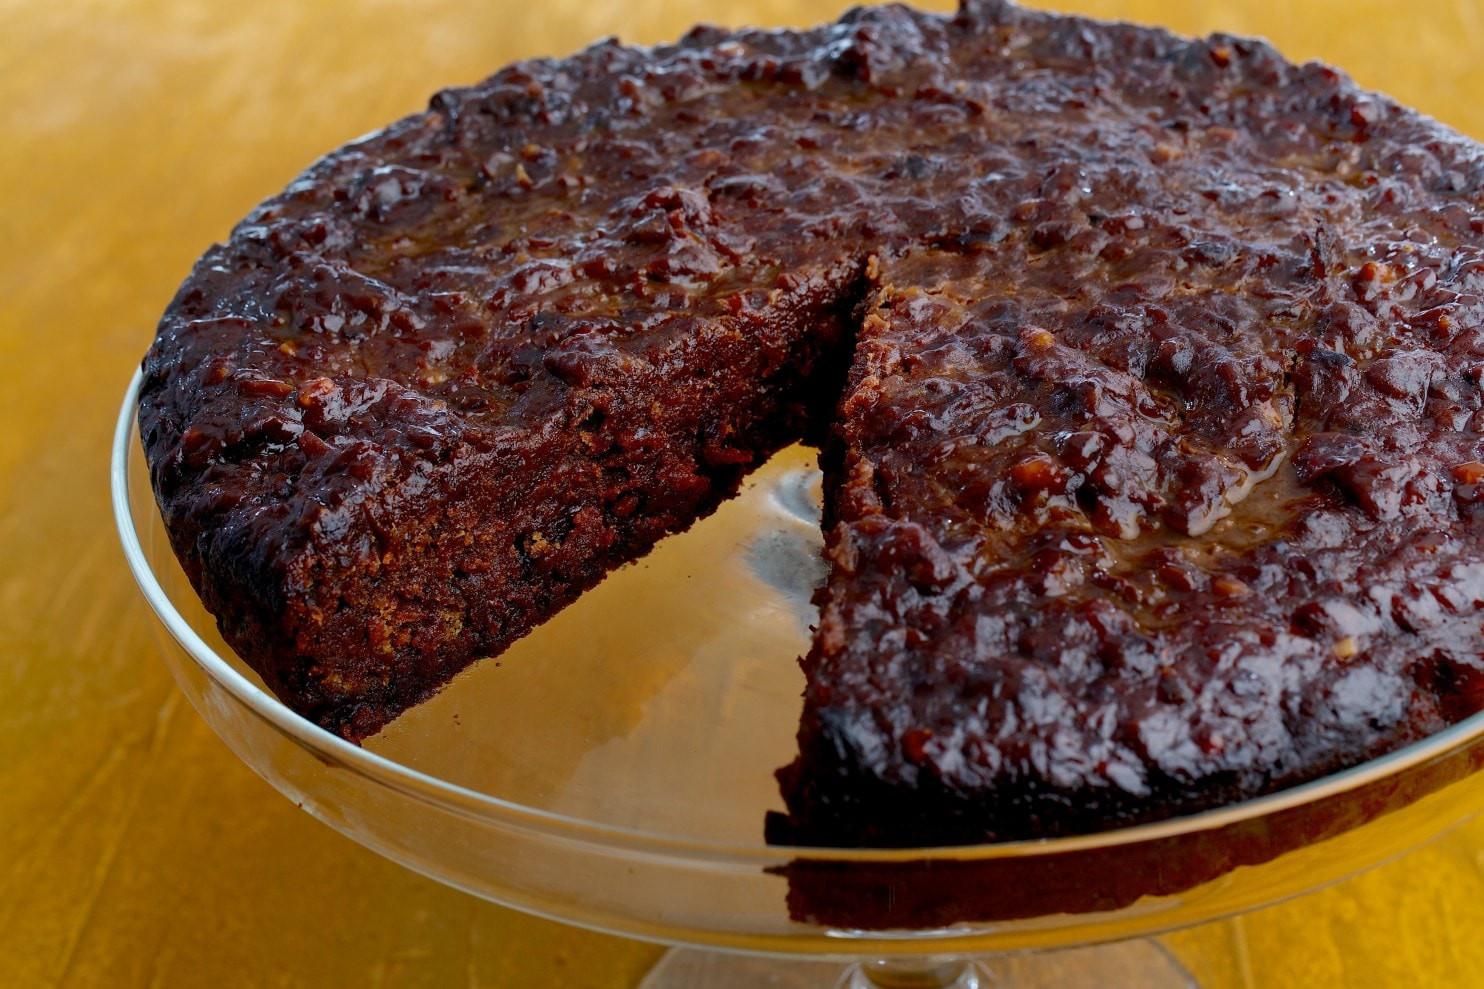 Black Cake Recipe  Trinidad Black Cake The Washington Post